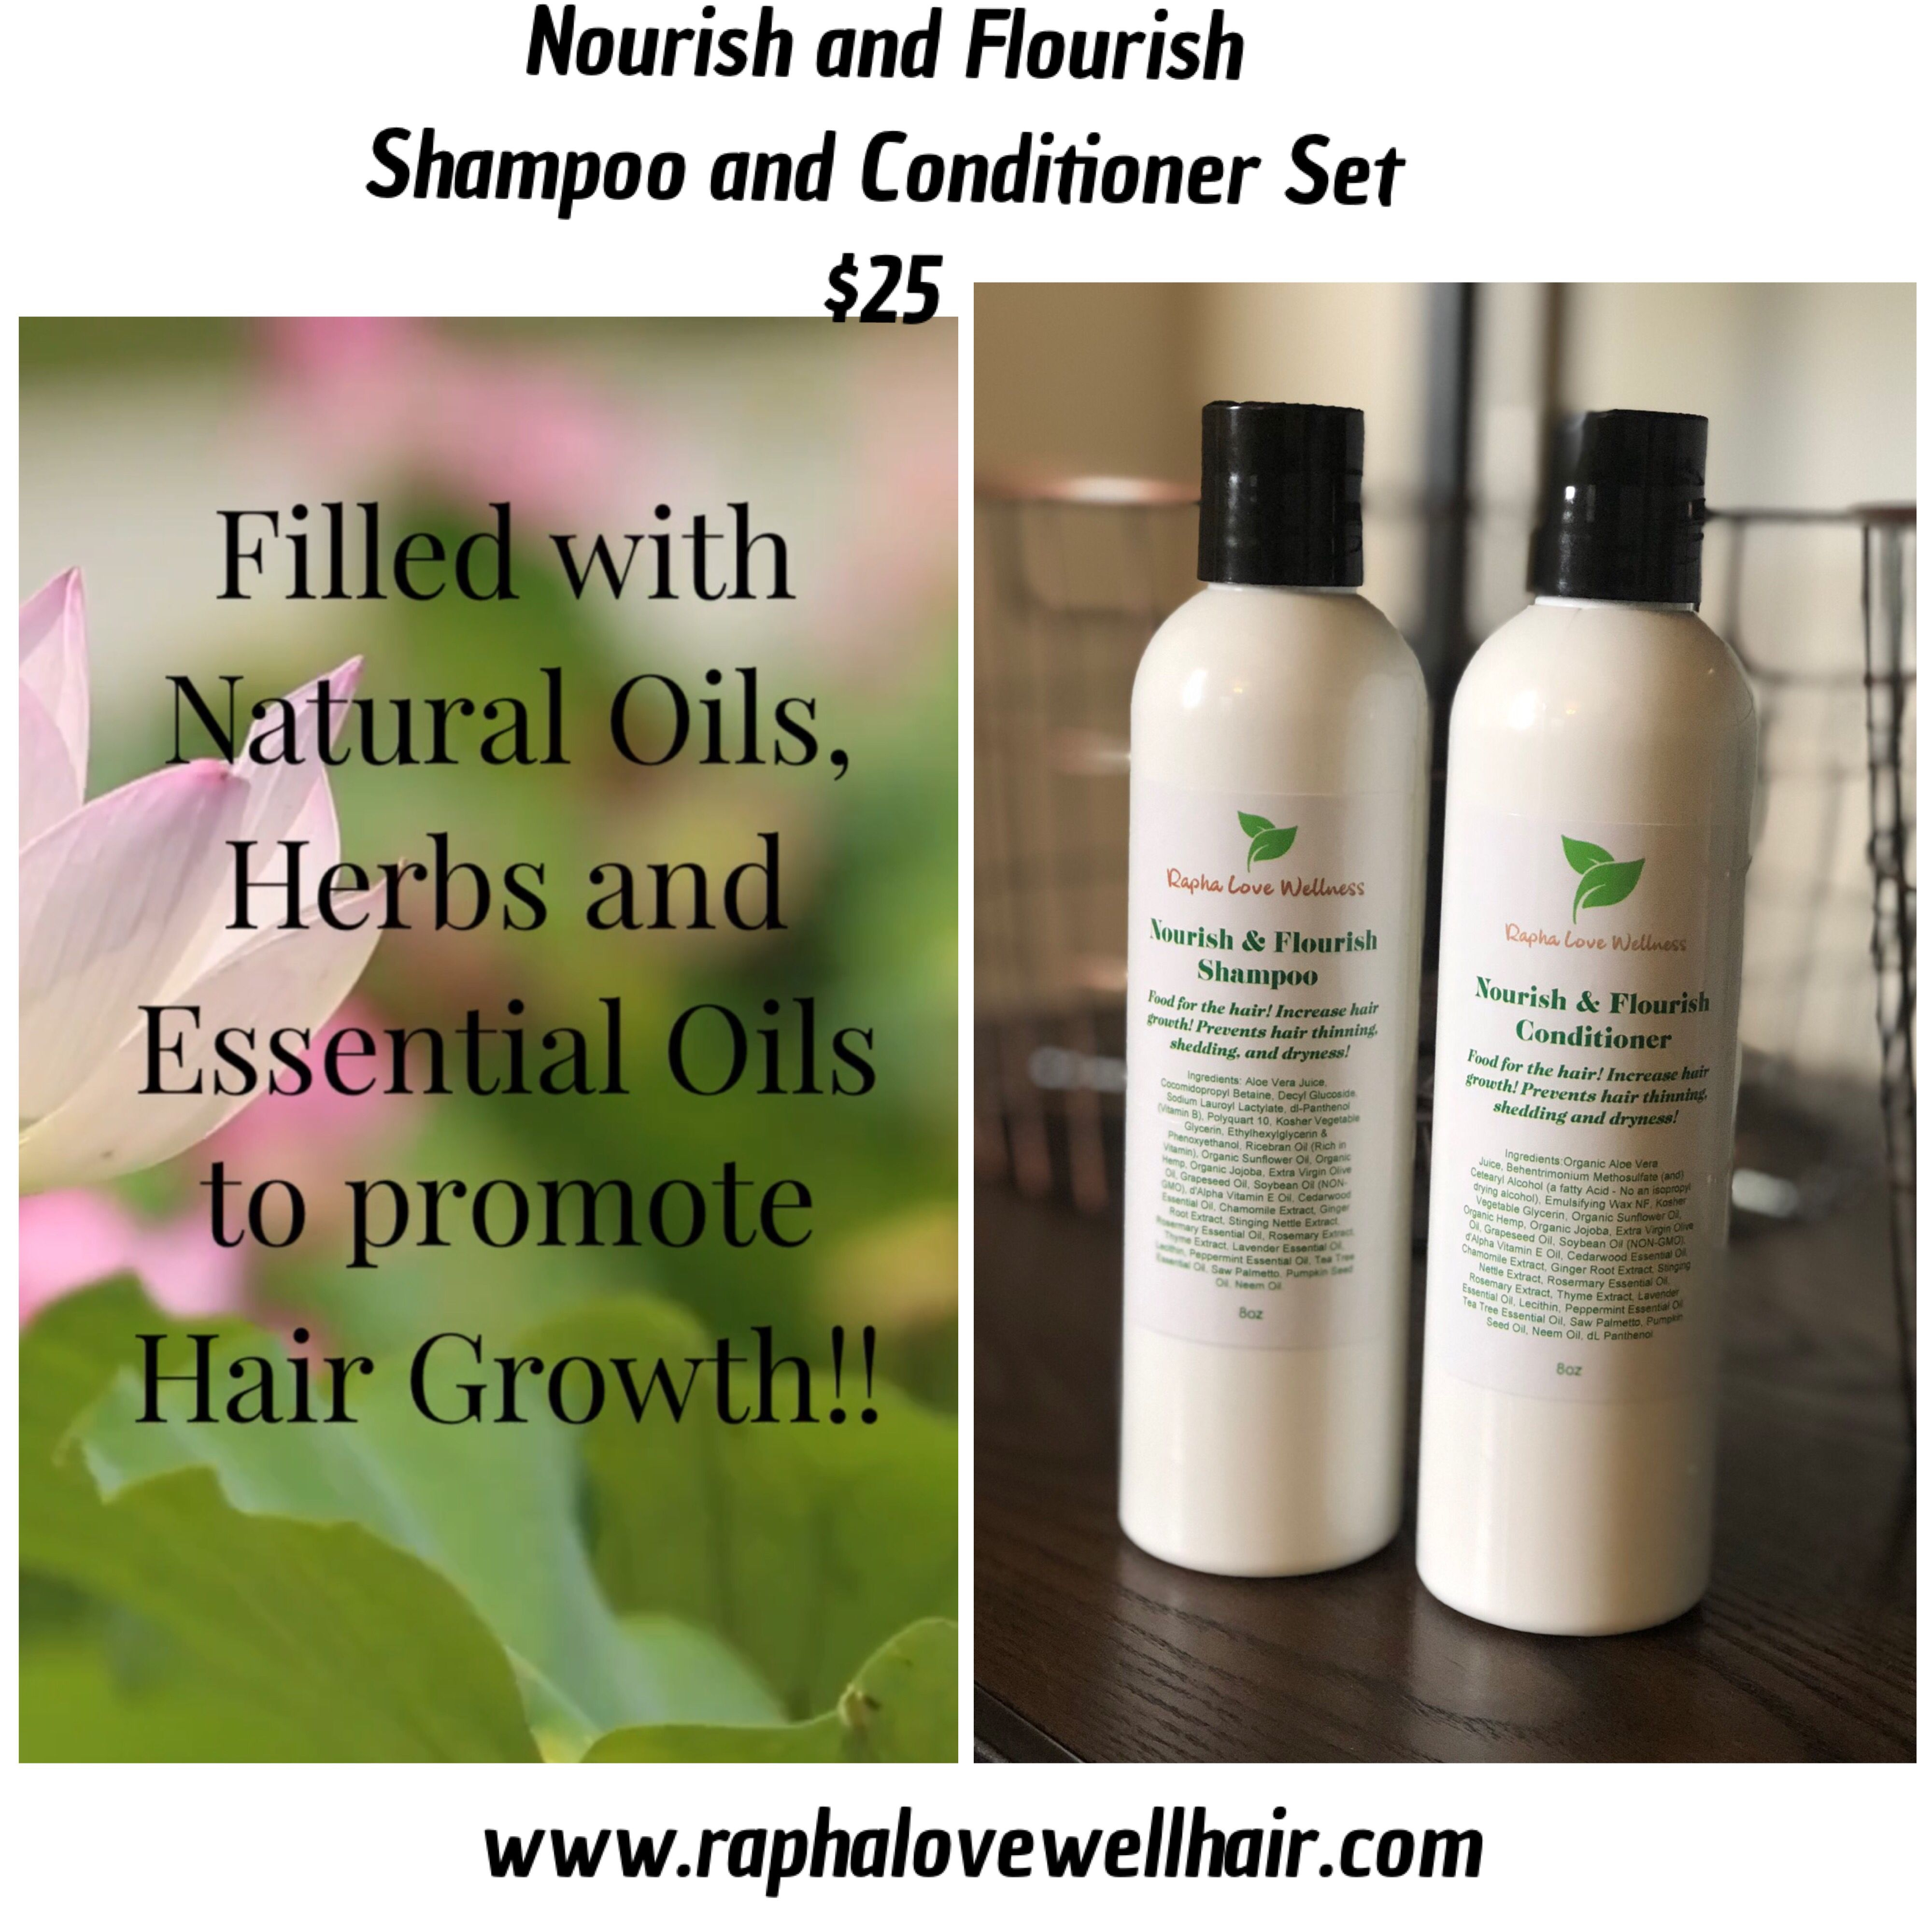 Rapha Love Wellness Nourish and Flourish Shampoo and Conditioner